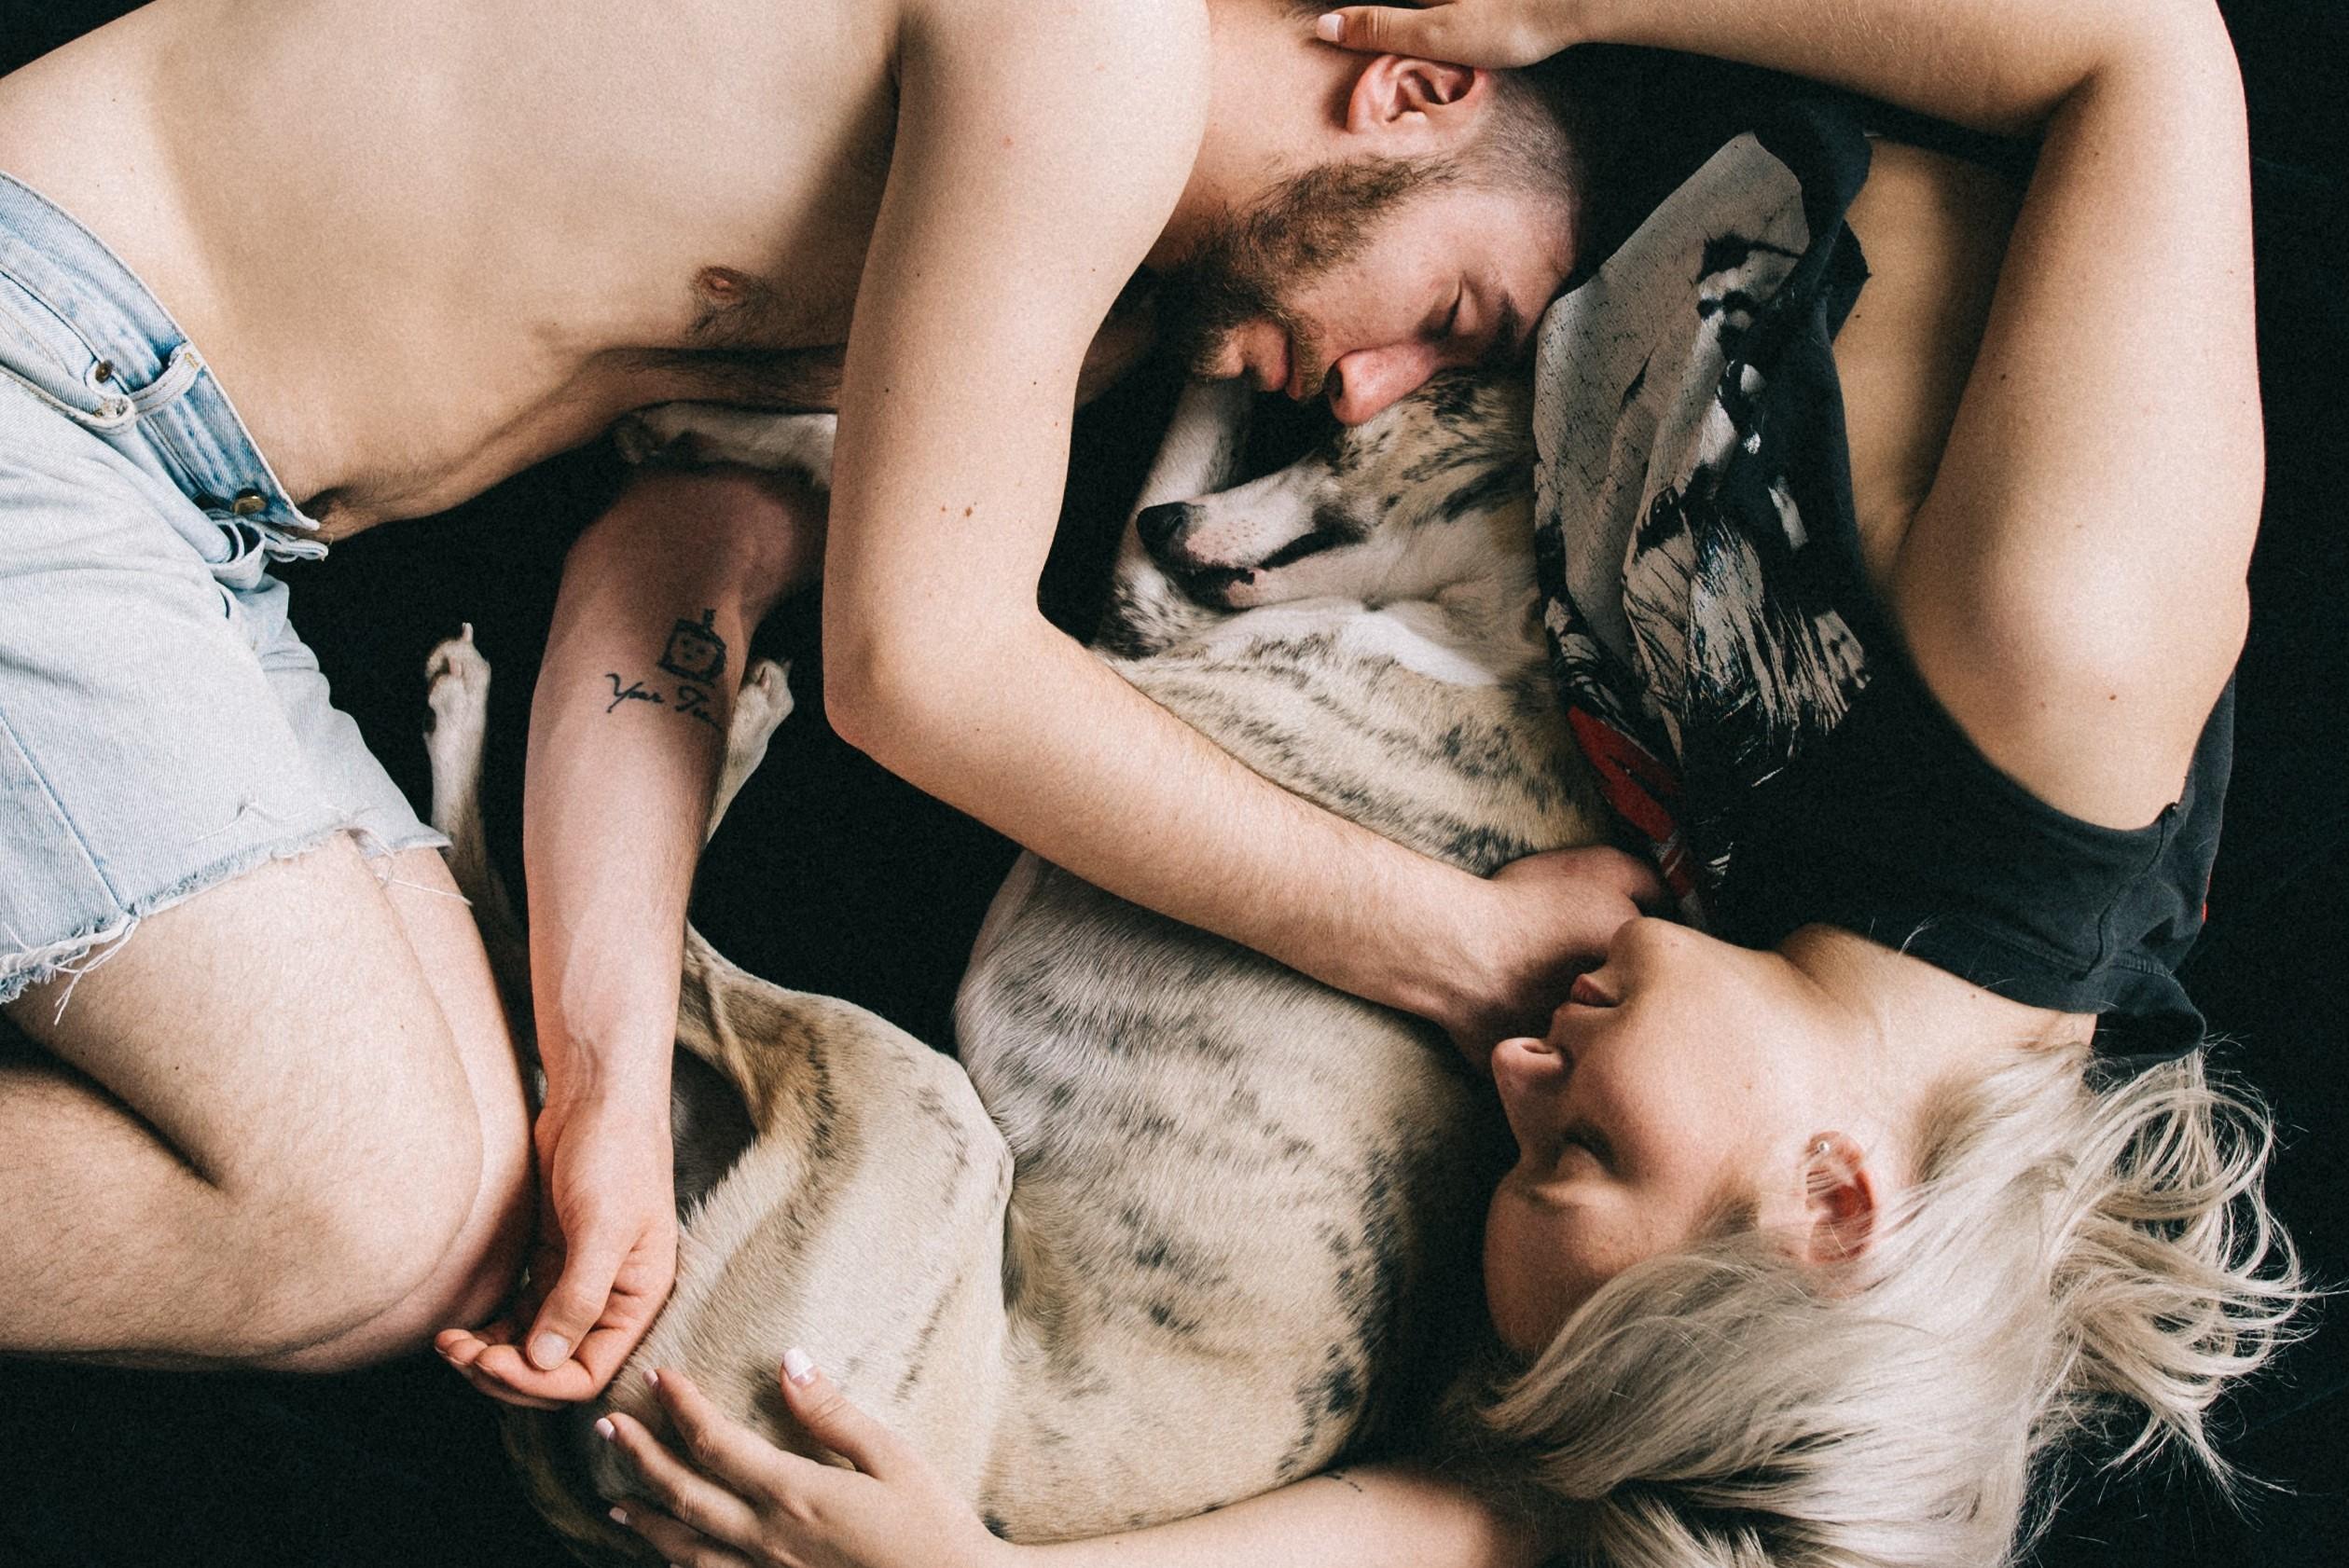 Human Animal BodyMind Connection